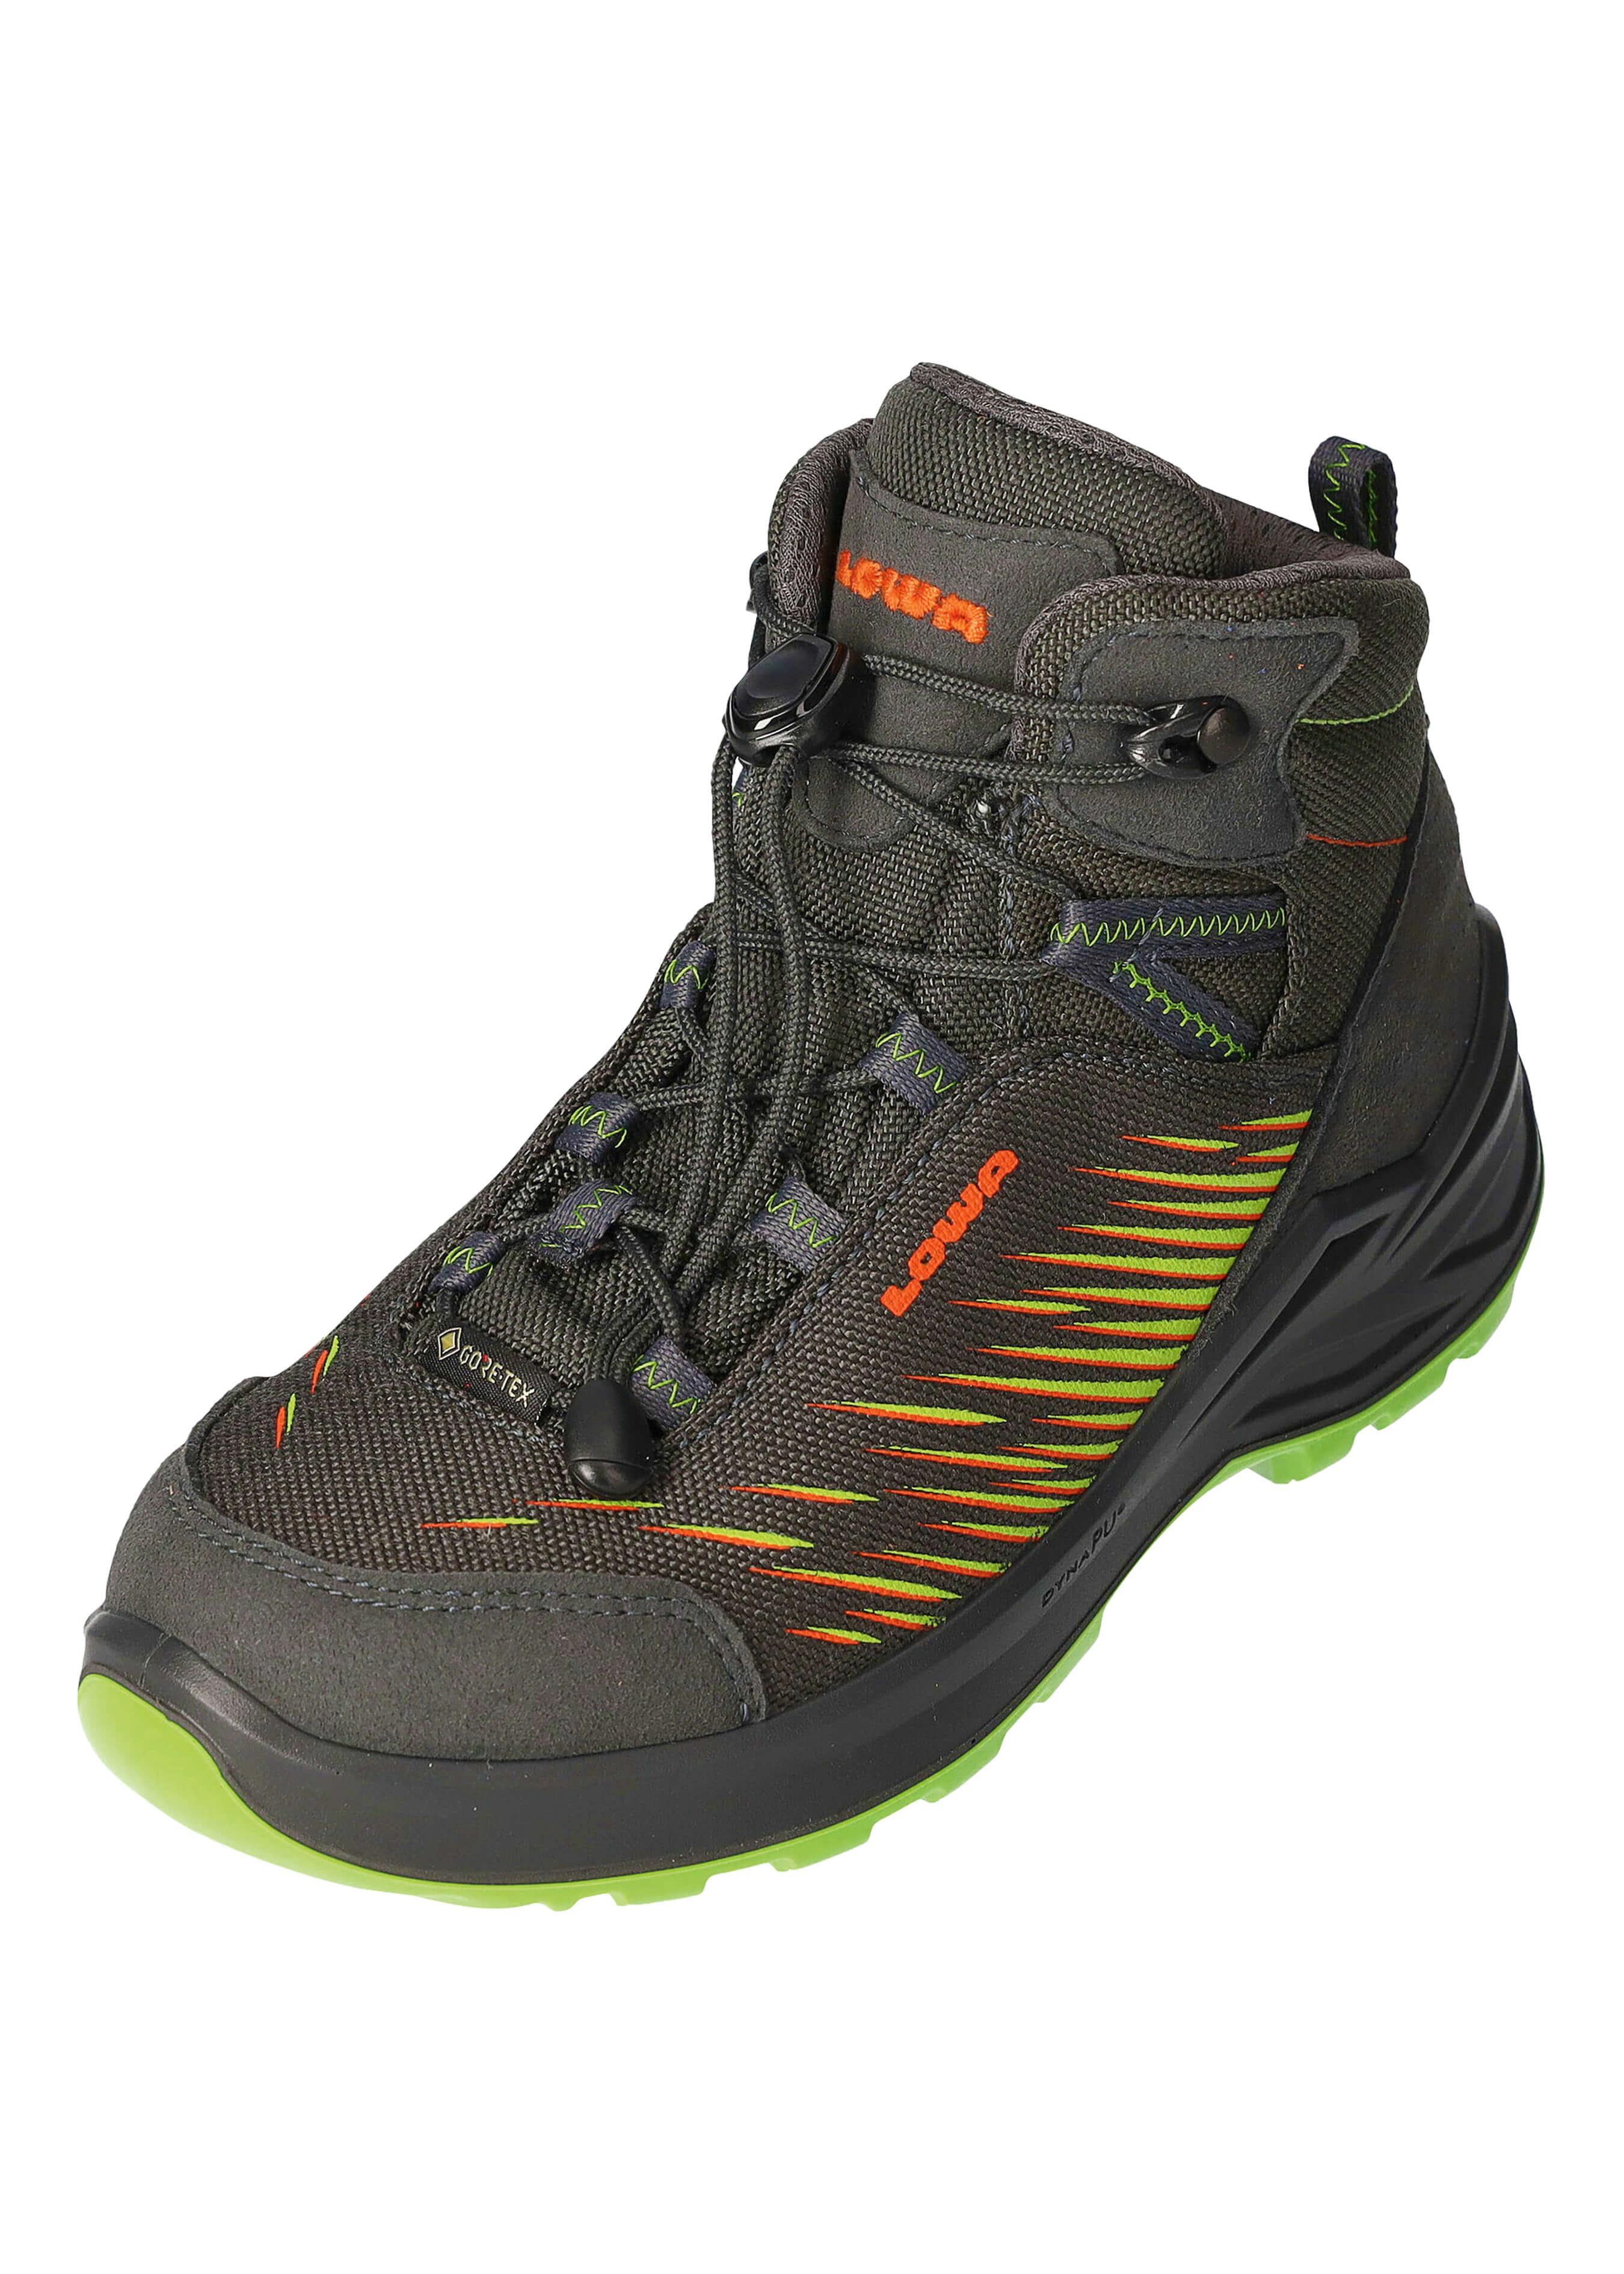 Zirrox GTX chaussure de trekking montante pour enfants 42961223 1